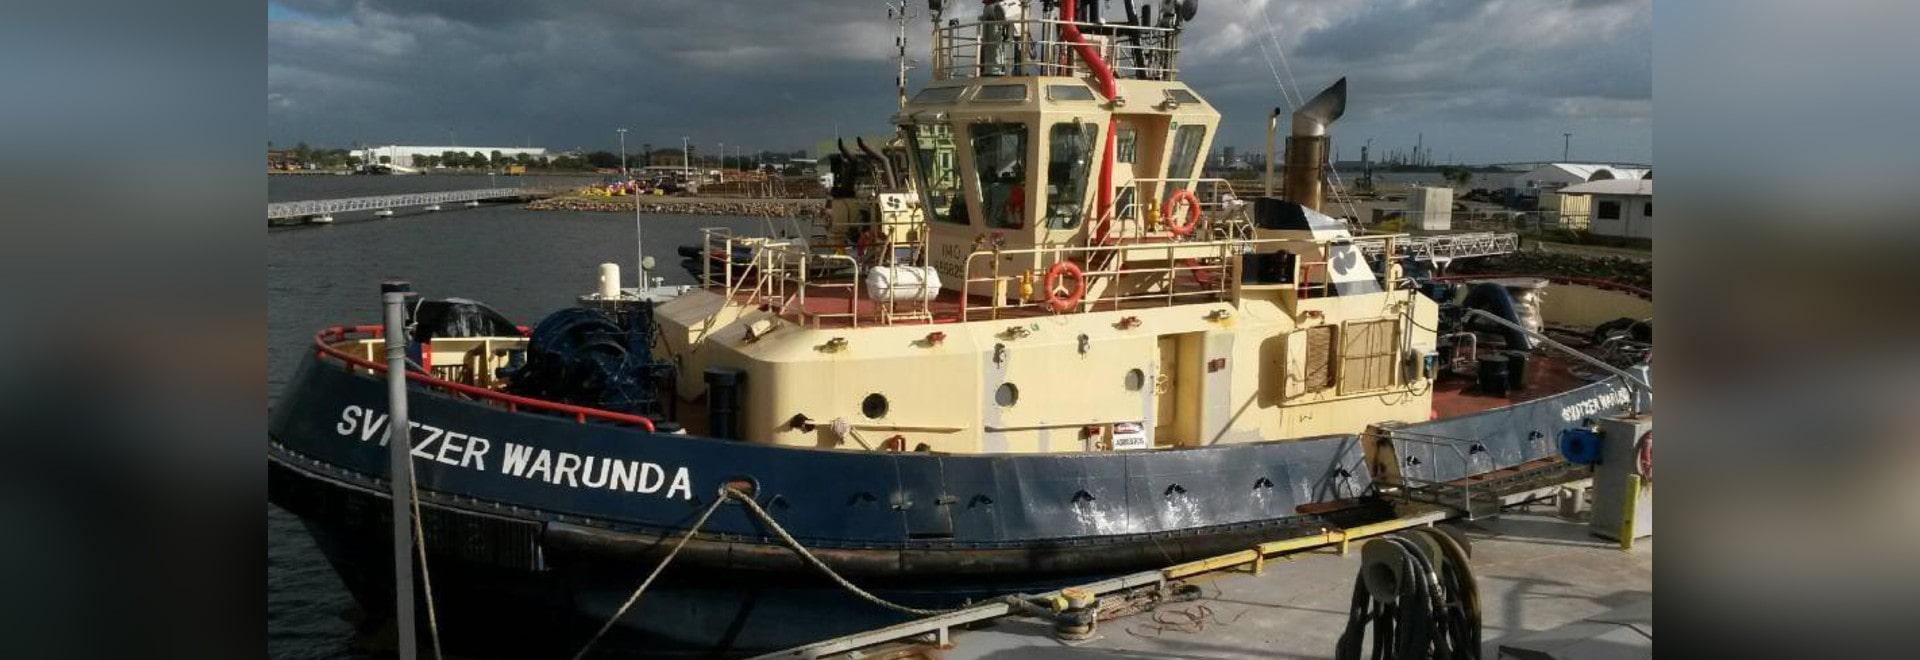 Svitzer Taking Contaminated Tugs to Singapore - Sundkaj 9